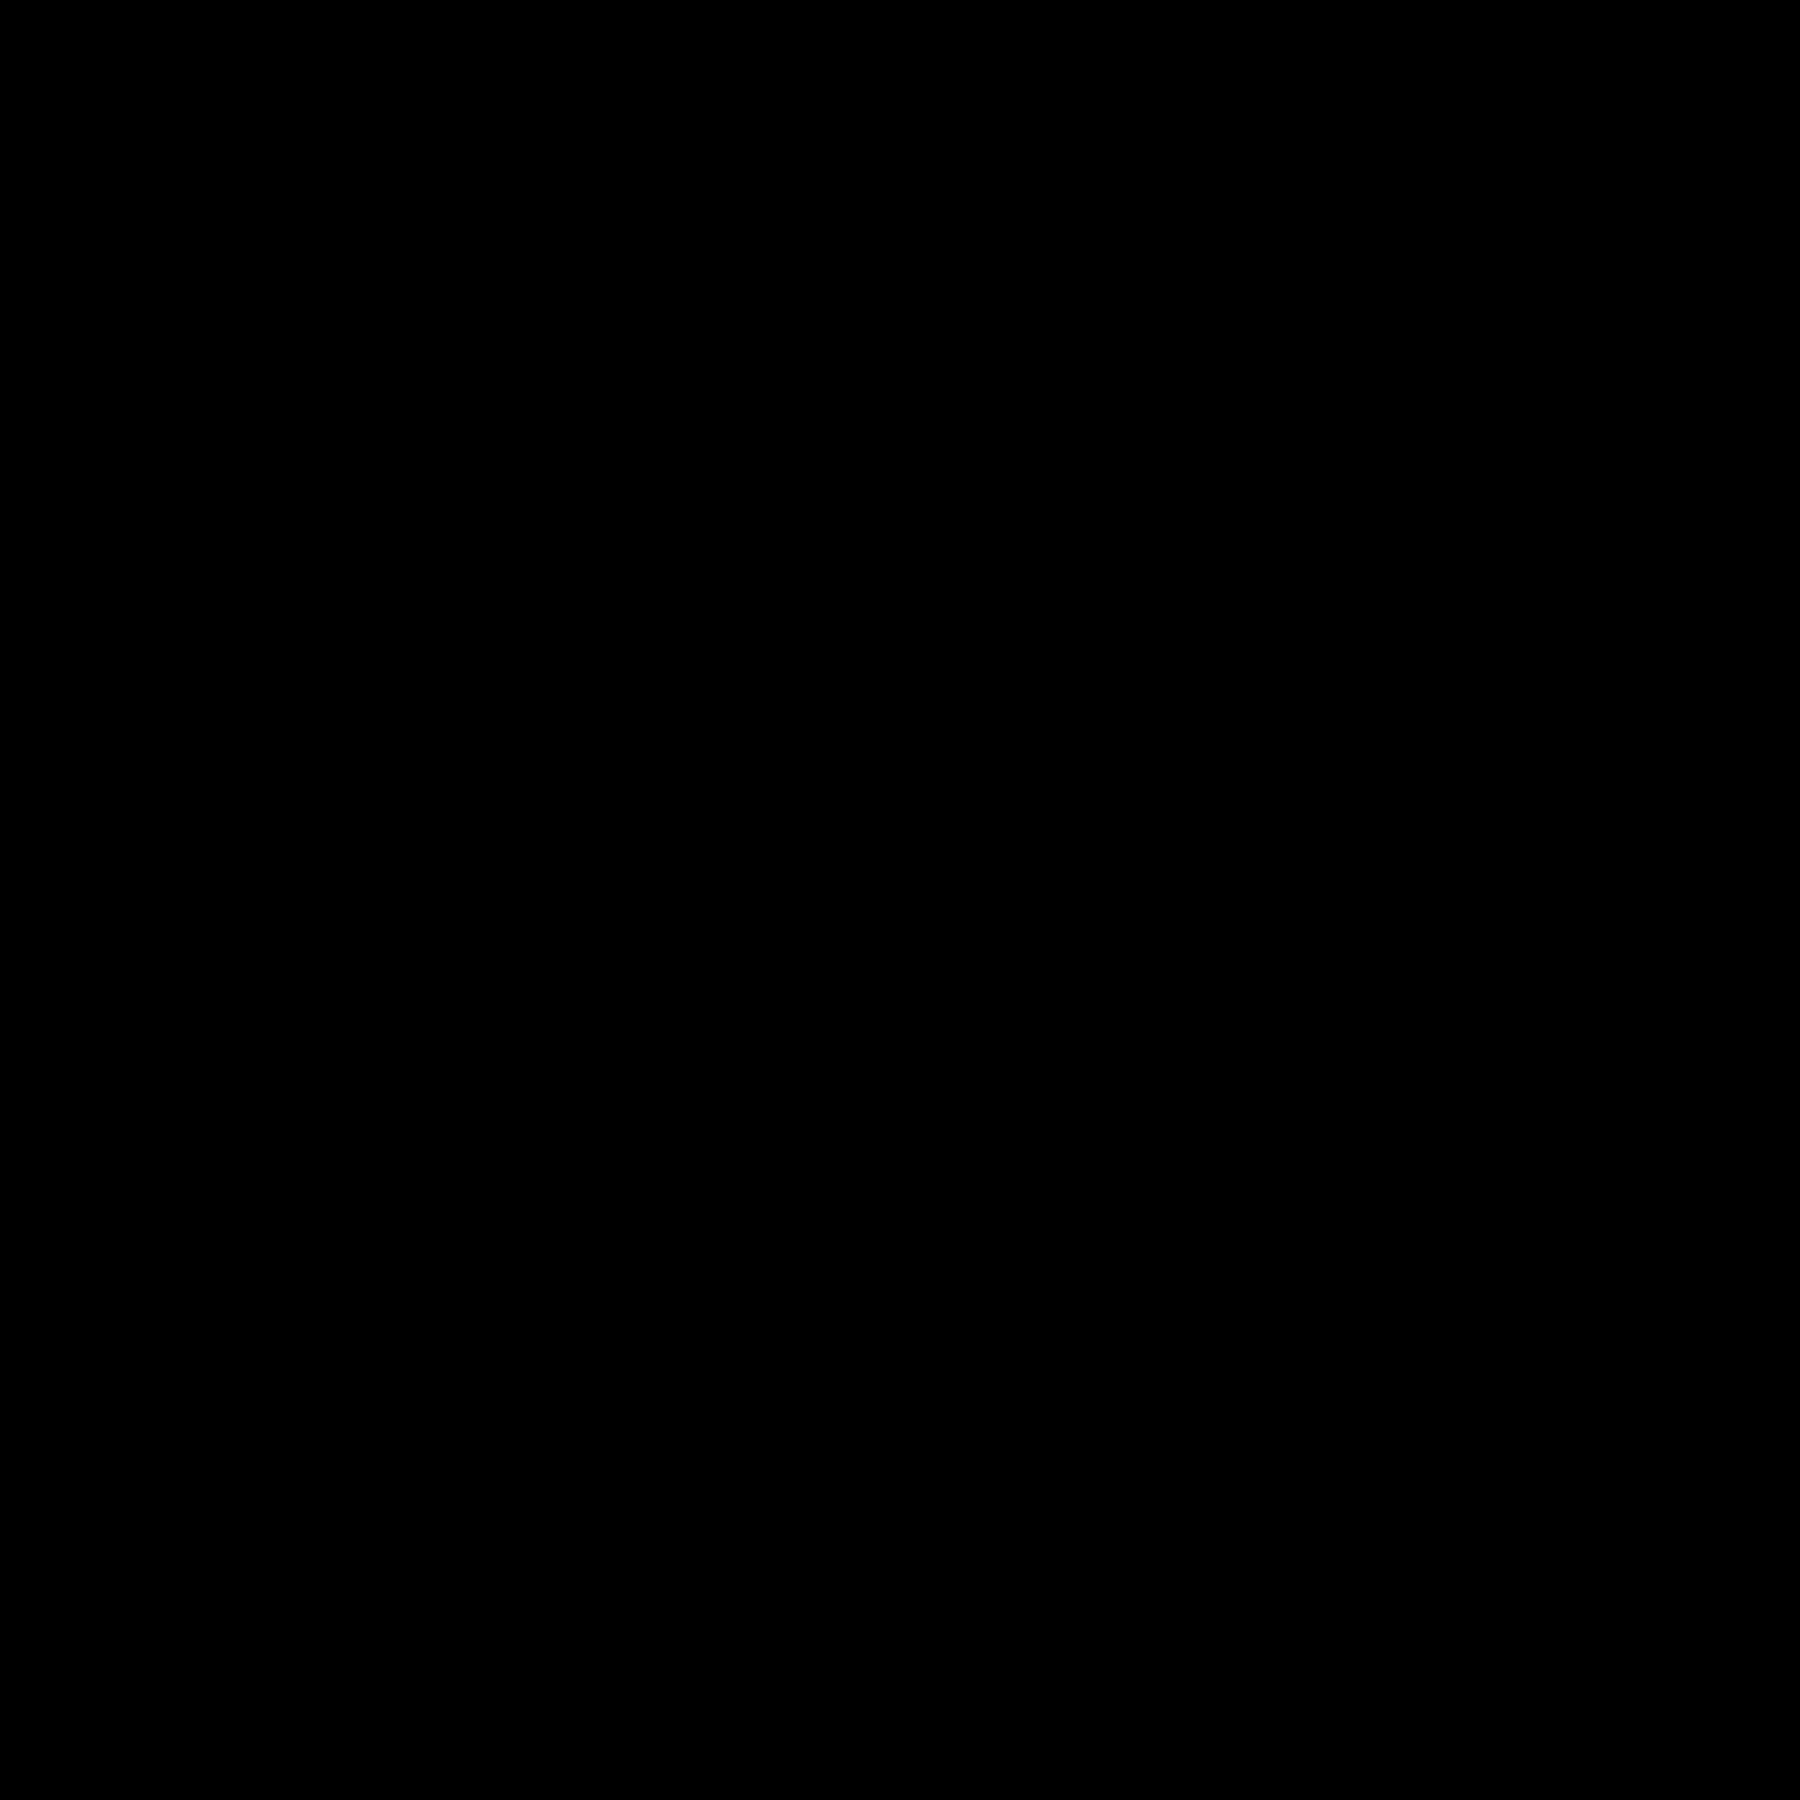 Basic Symbols-10.png